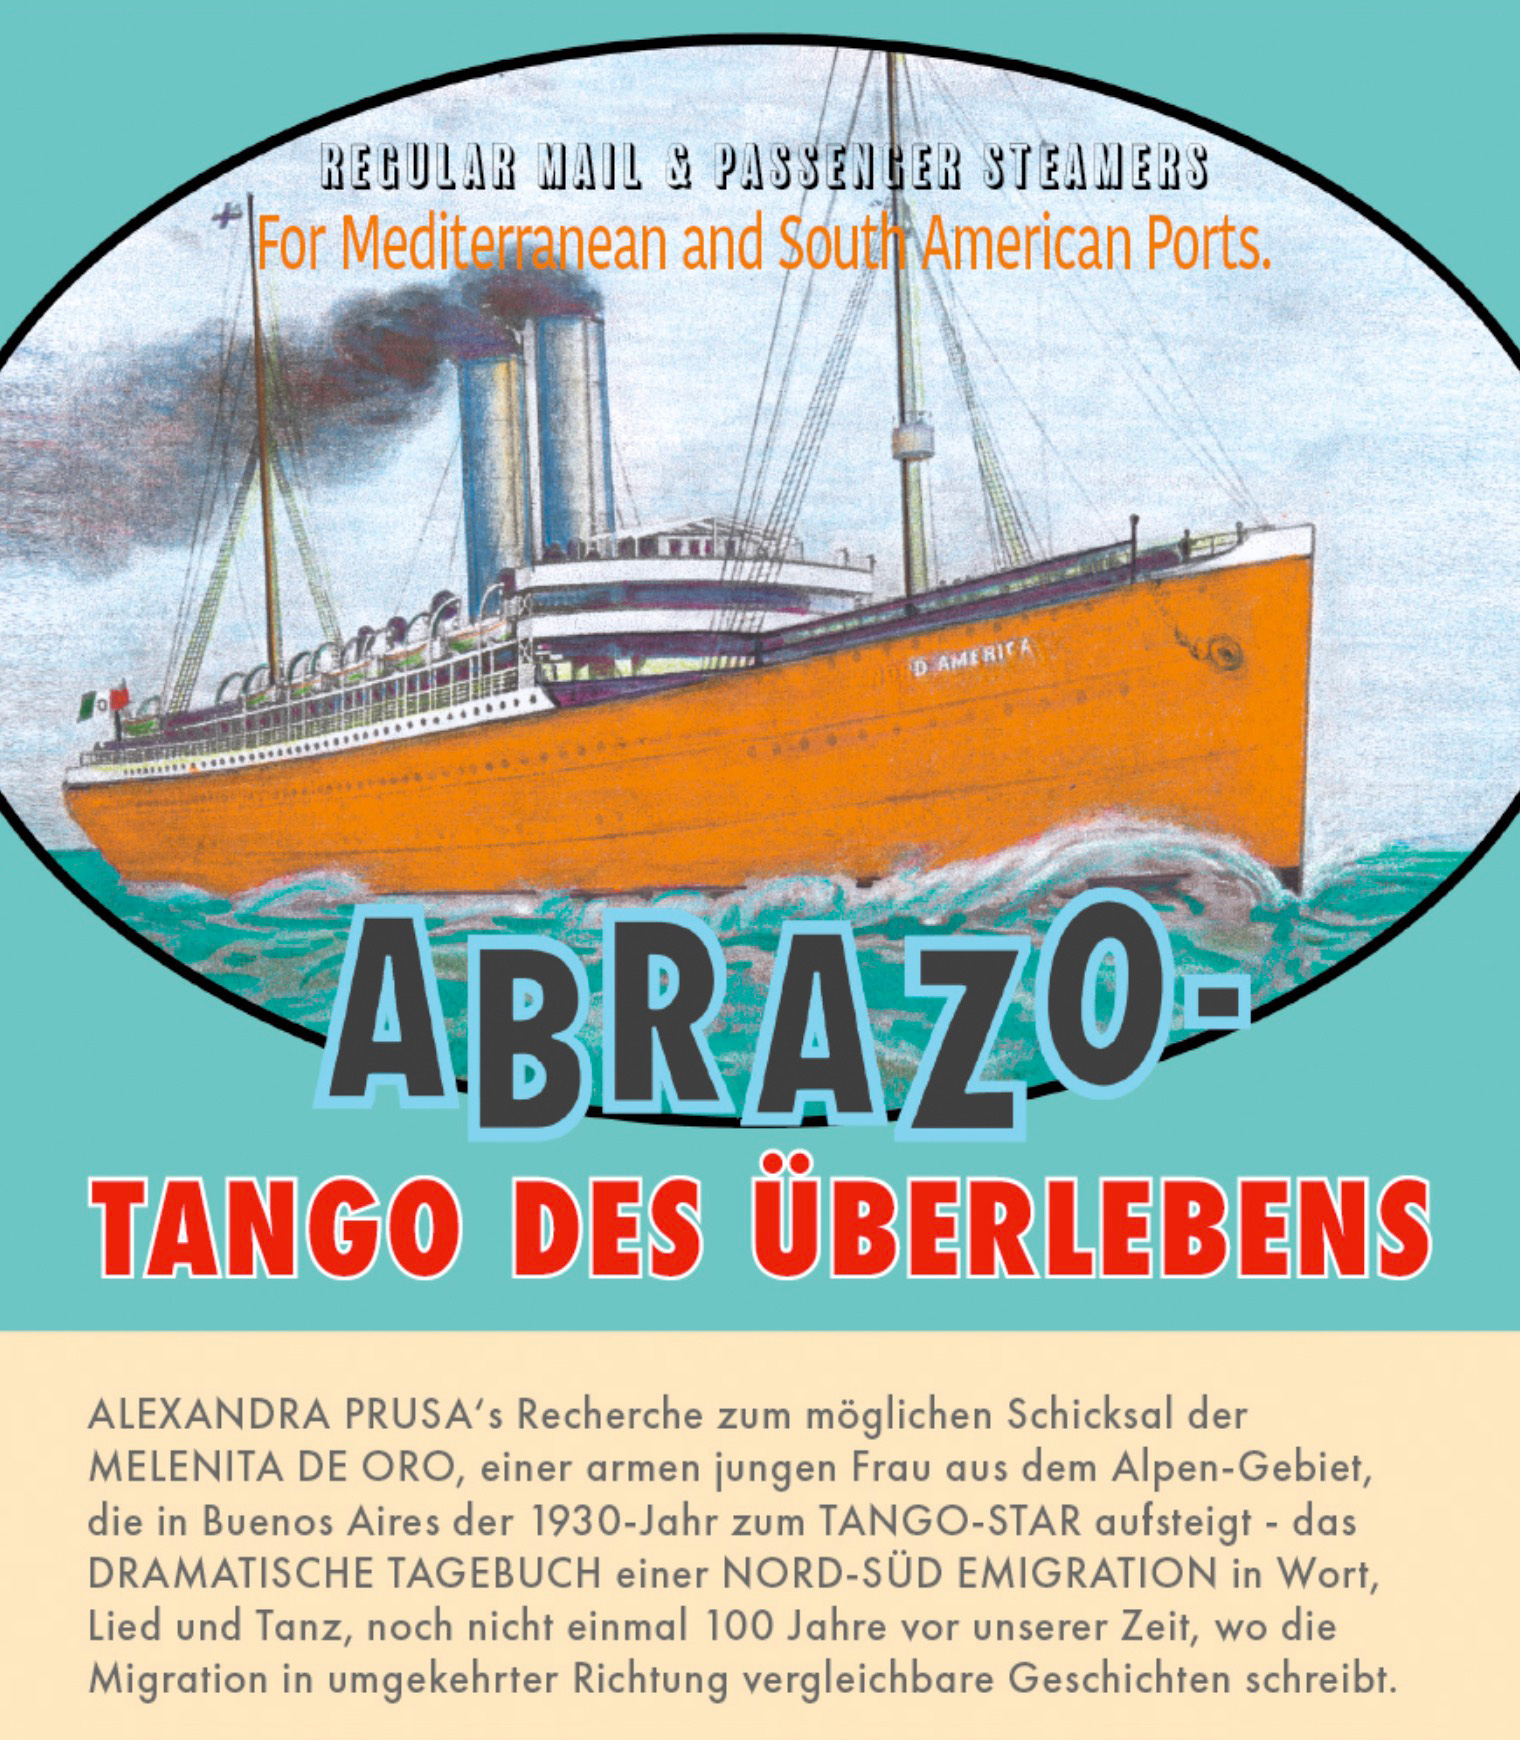 Abrazo Tango des Ueberlebens Aires